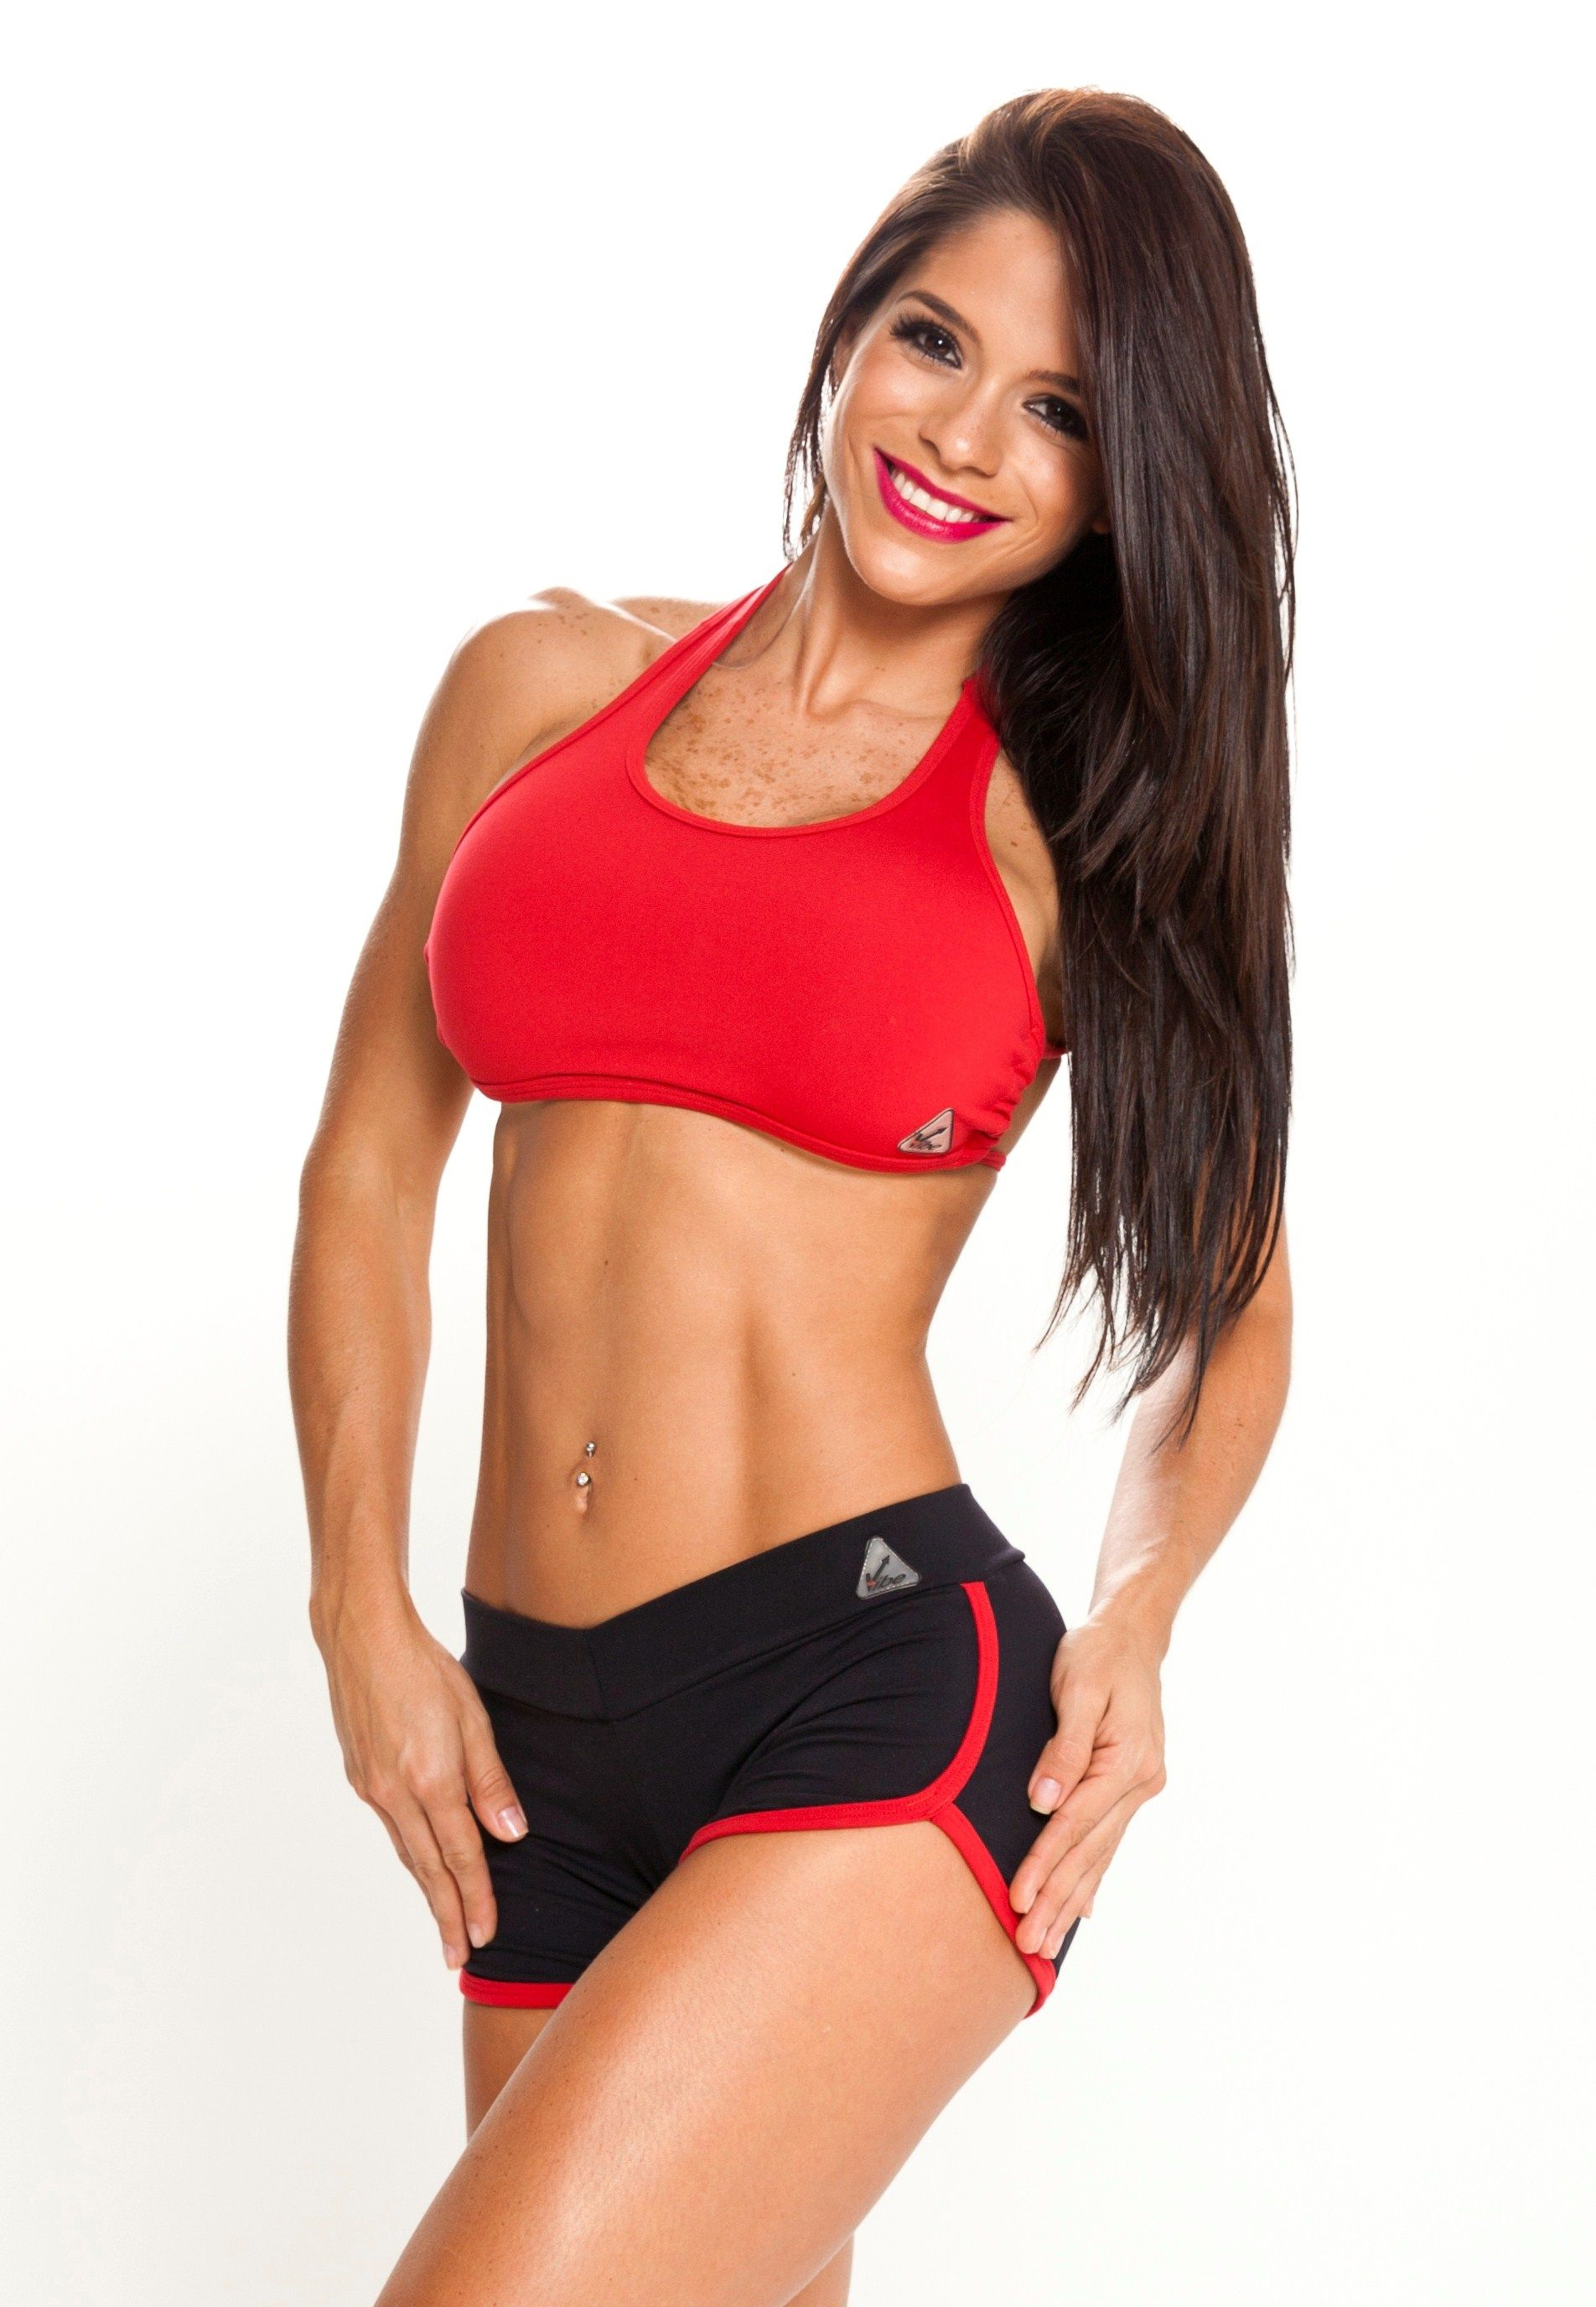 www.upvibe.com Michelle Lewis fitness model wearing ...